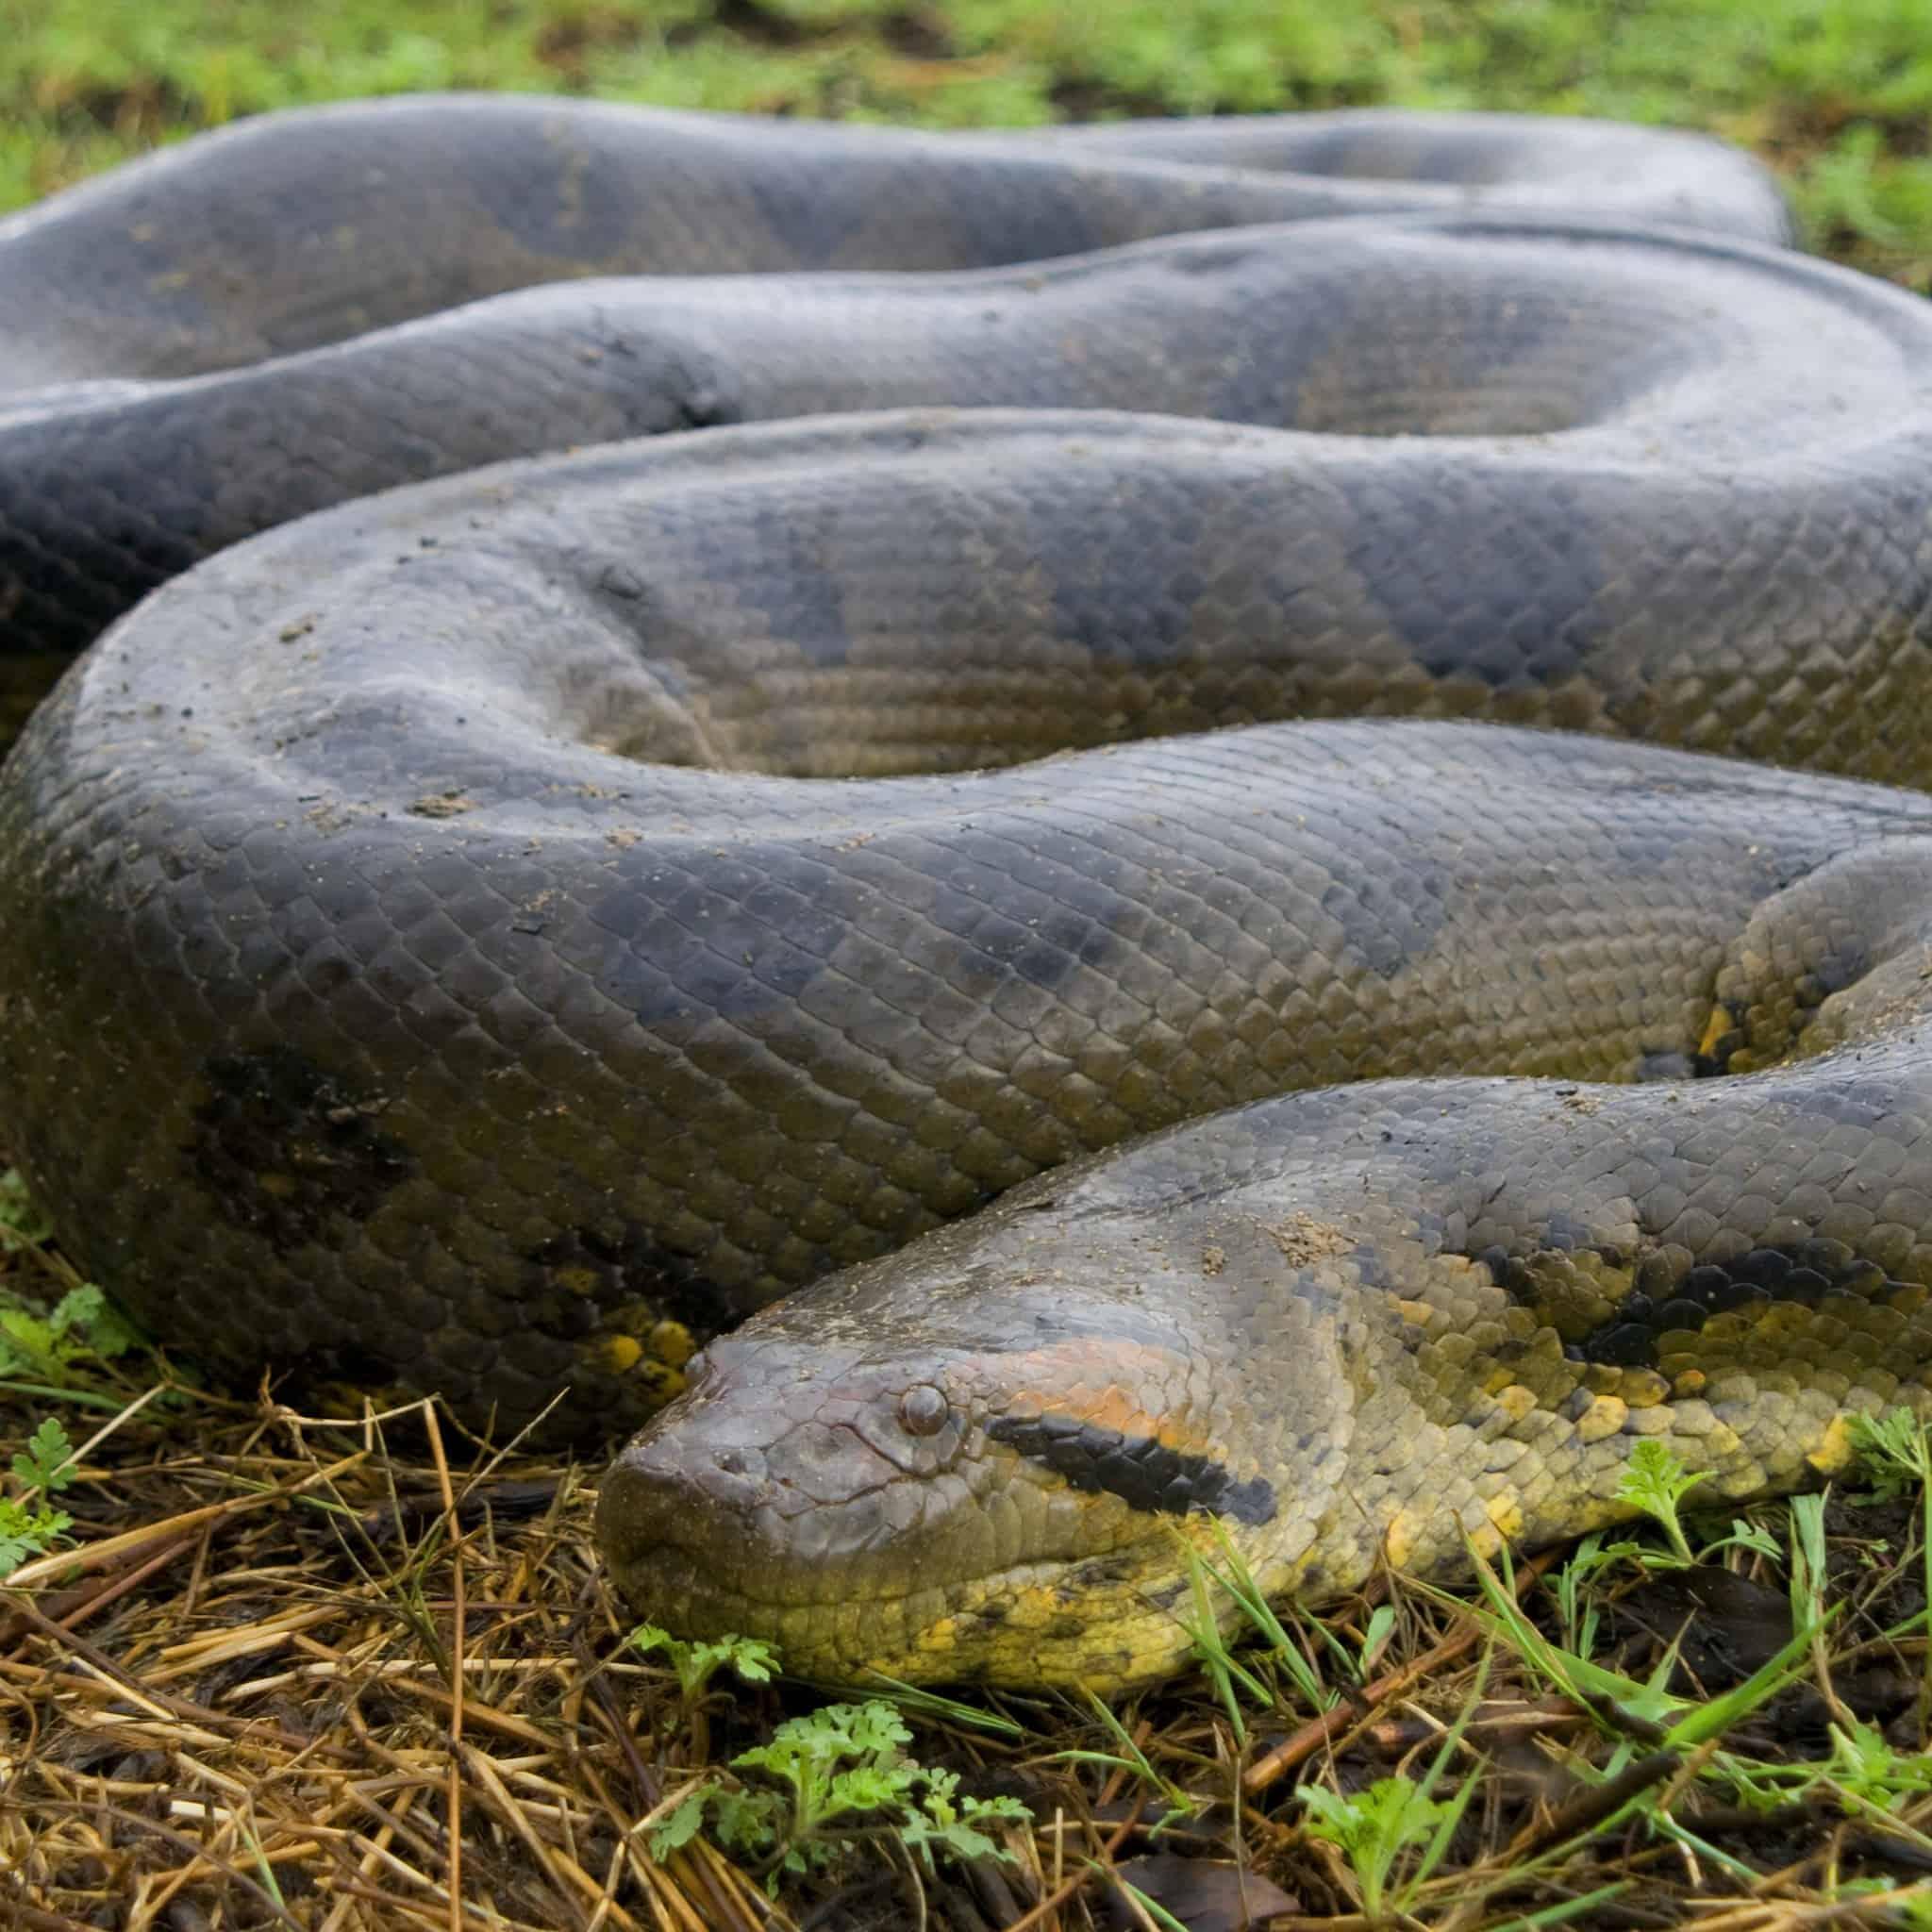 Green Anaconda- biggest snake